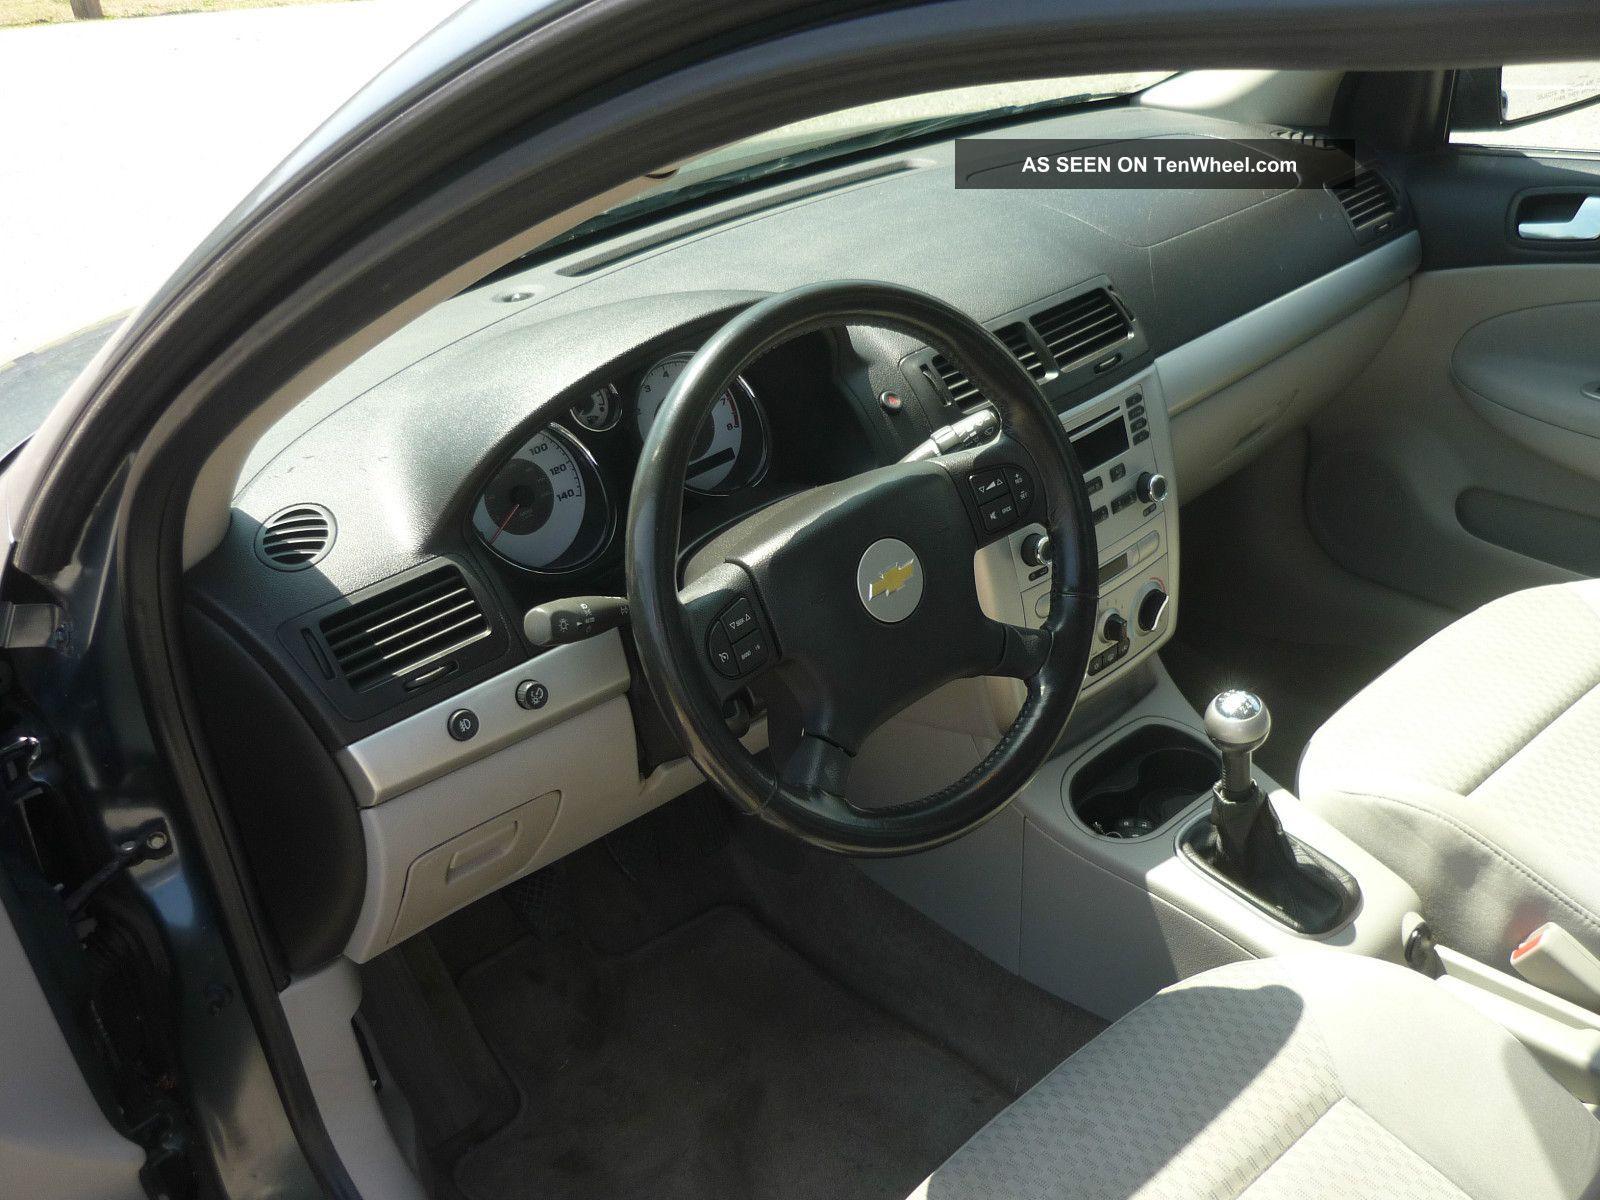 2005 Chevrolet Cobalt Ls 5 Speed Recovered Theft